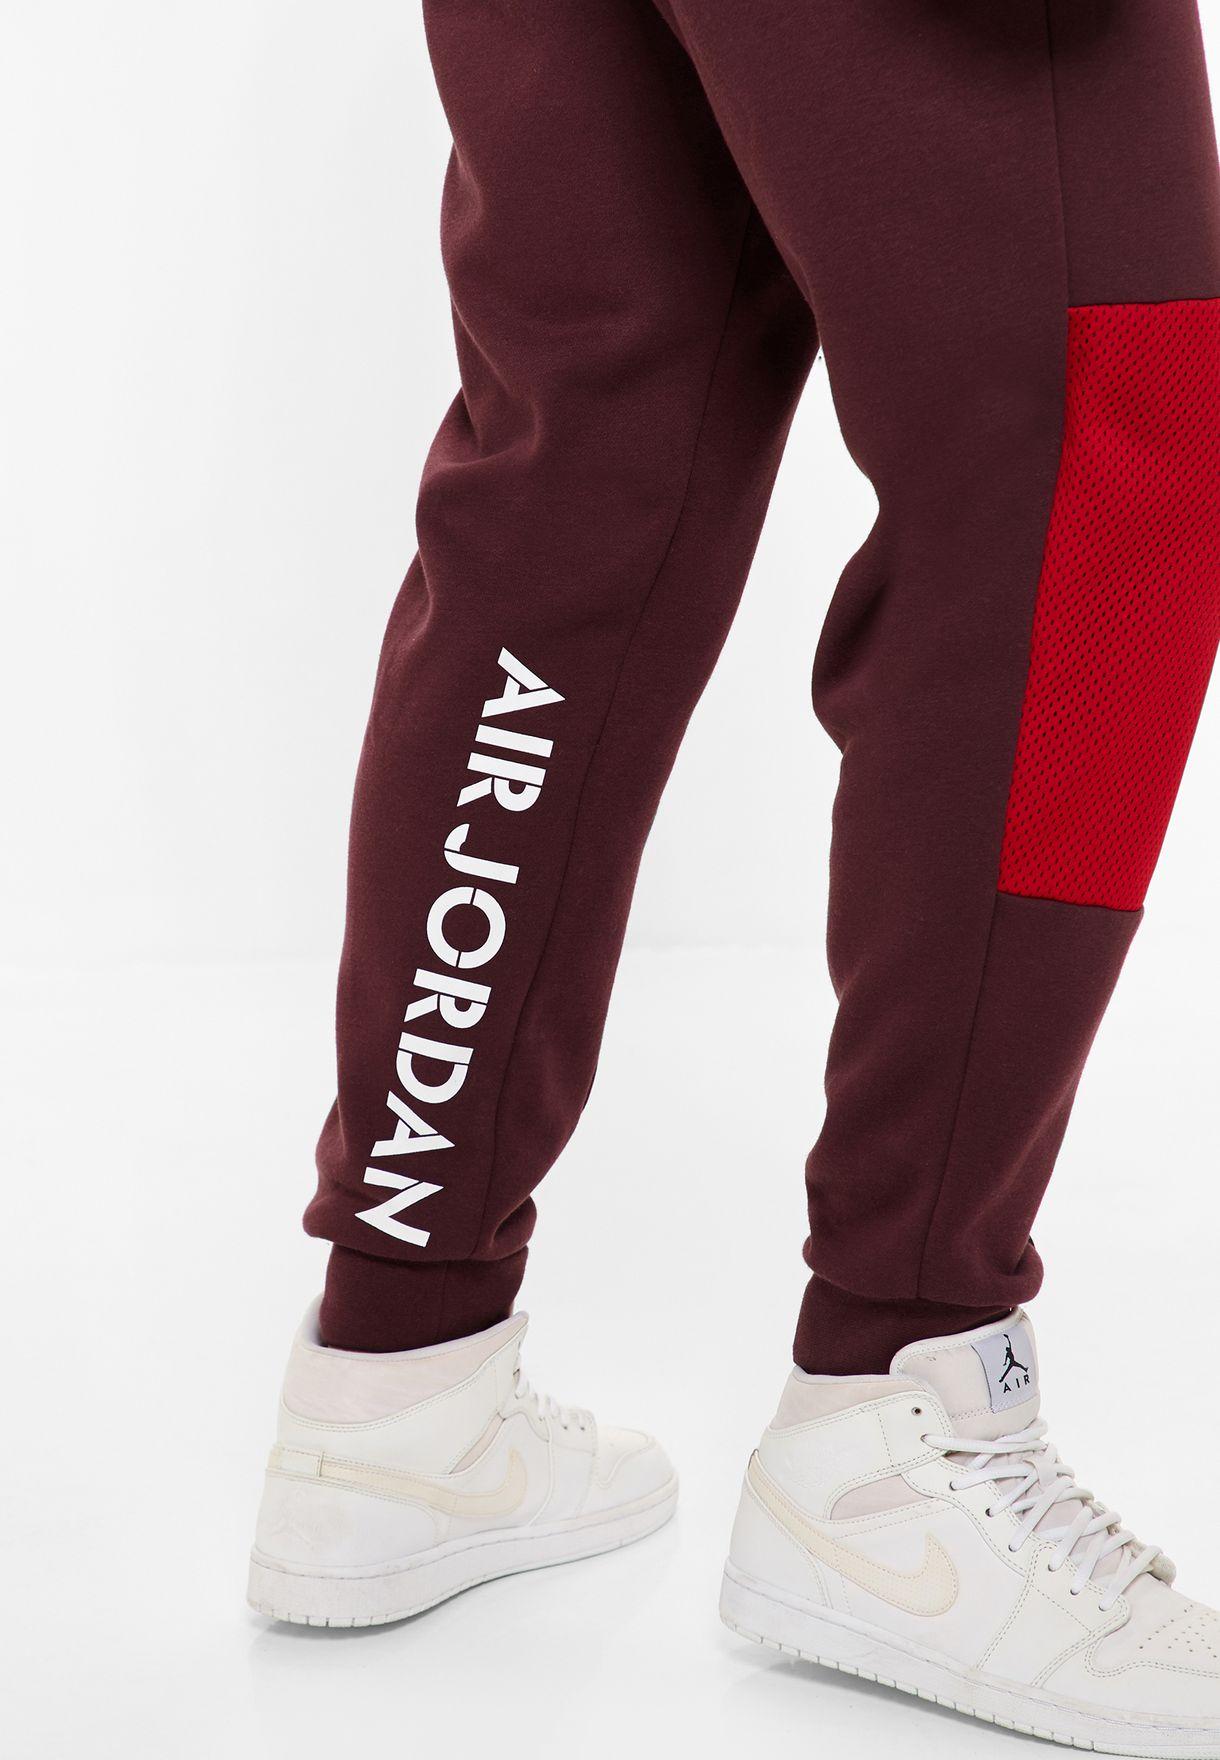 6f660a22190b11 Shop Nike burgundy Jordan Jumpman Hybrid Fleece Sweatpants AA1447 ...